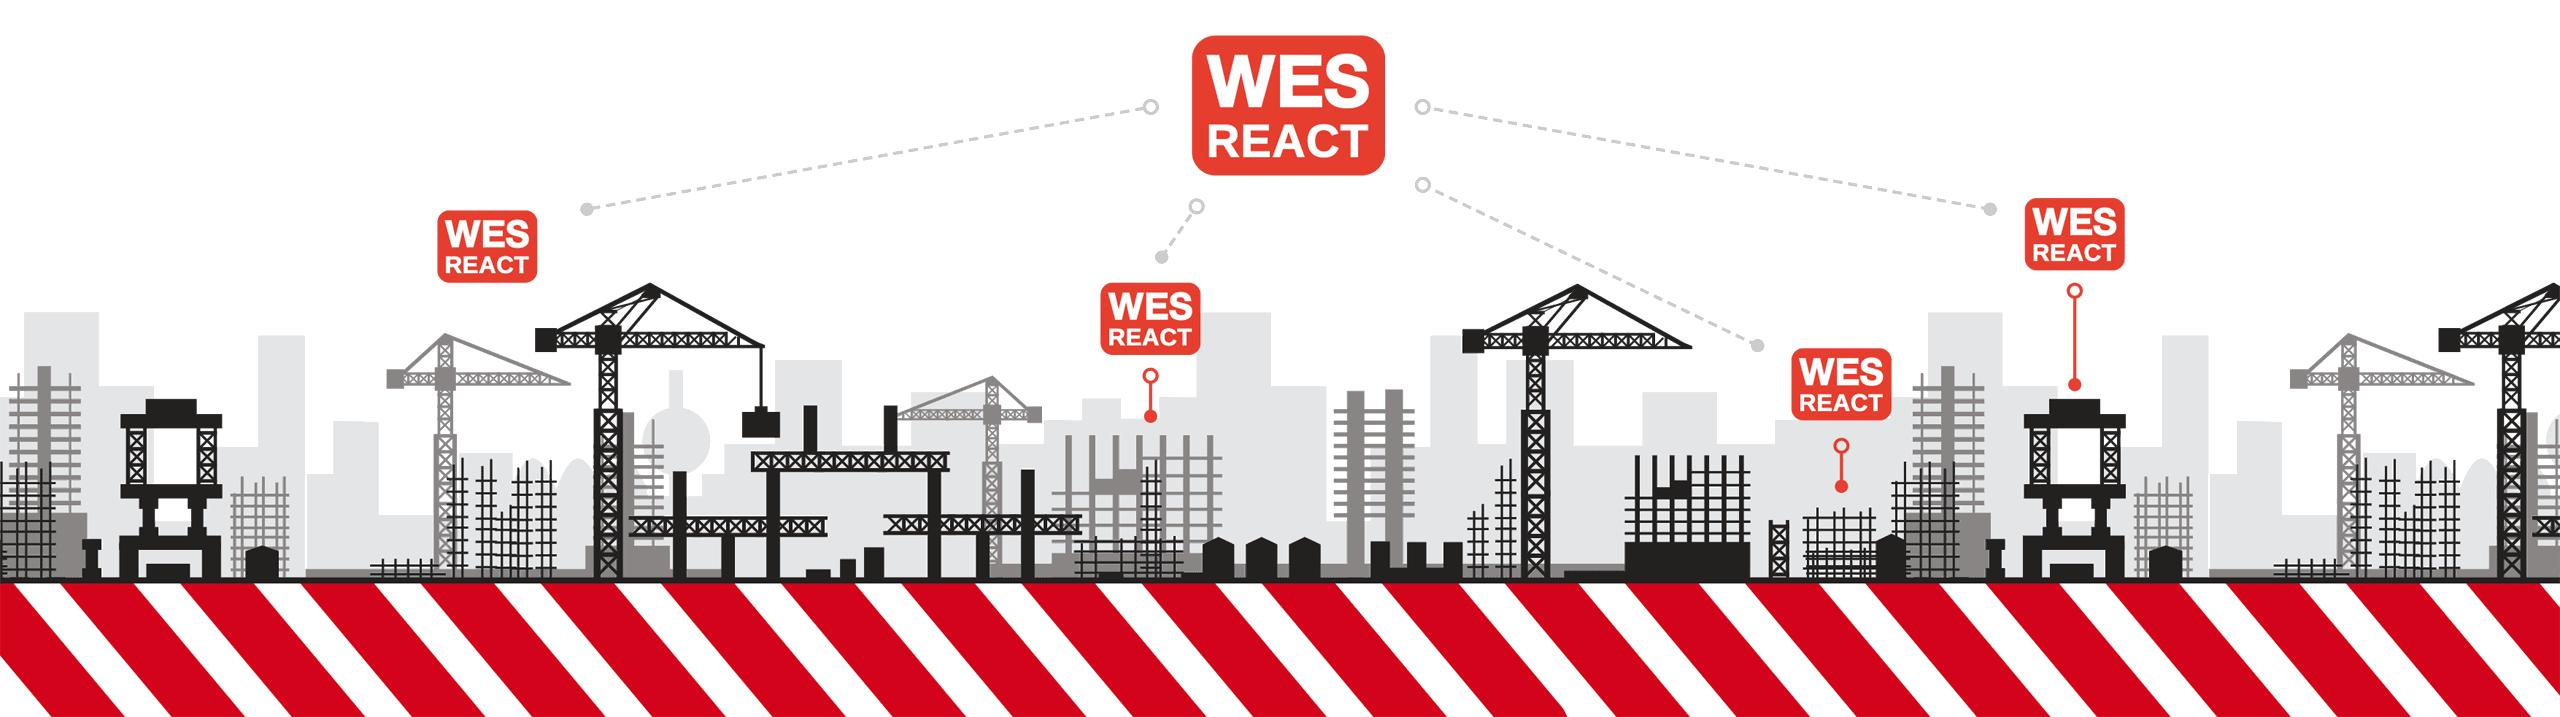 WES REACT Managementsystem zentrale Steuerung WES3 Arbeitsschutz ESB Solutions